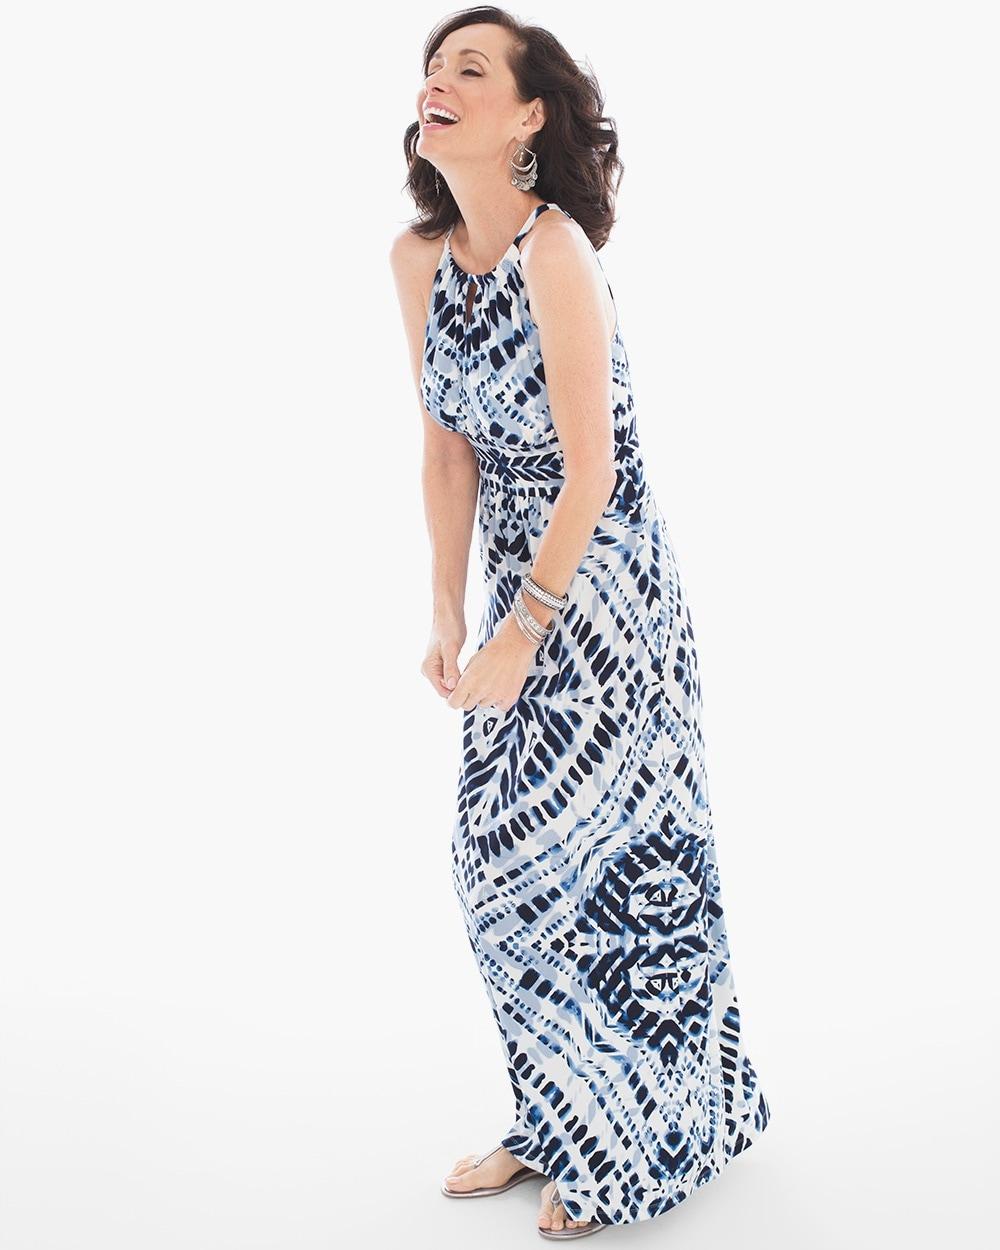 a2d5759e23 Return to thumbnail image selection Blue Diamond Tie-Dye Maxi Dress video  preview image